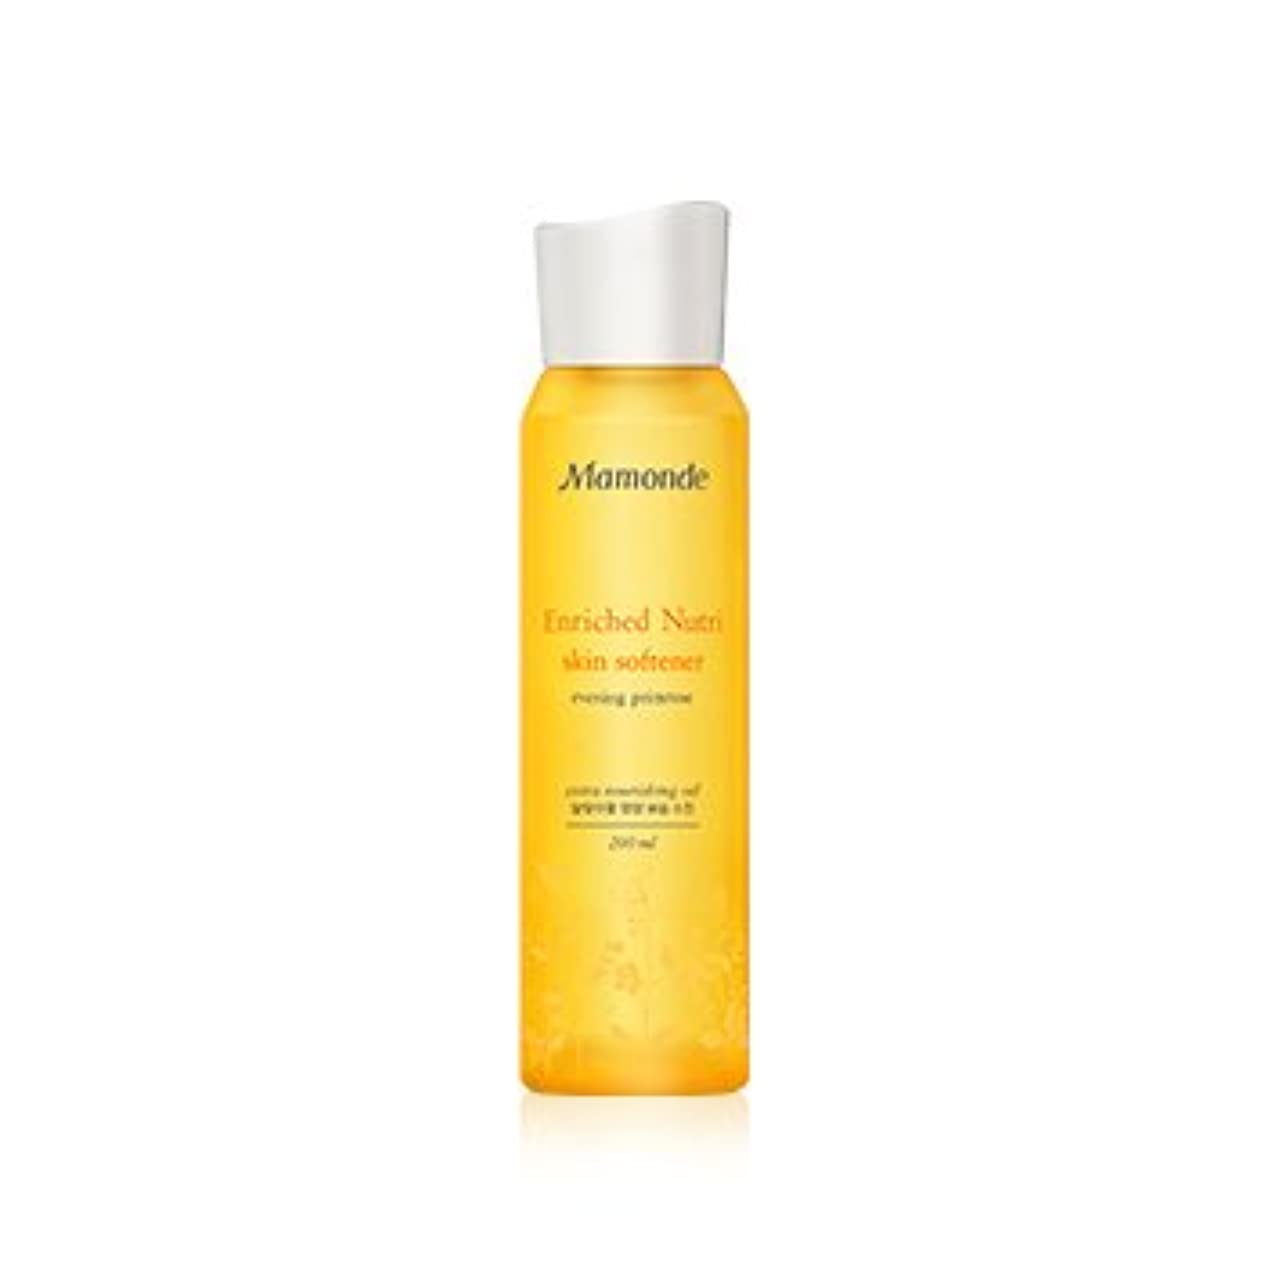 [New] Mamonde Enriched Nutri Skin Softener 200ml/マモンド エンリッチド ニュートリ スキン ソフナー 200ml [並行輸入品]